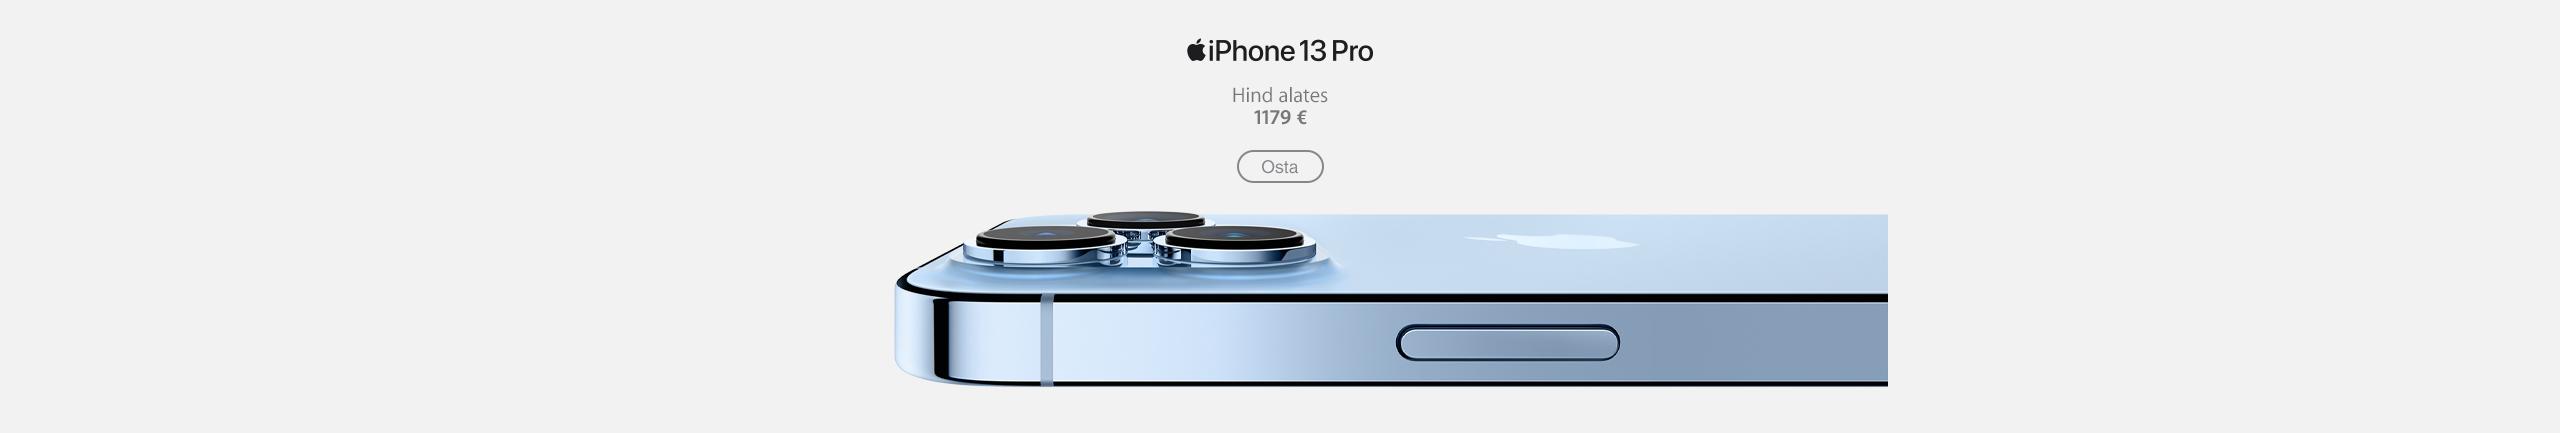 NPL Buy Apple iPhone 13 Pro